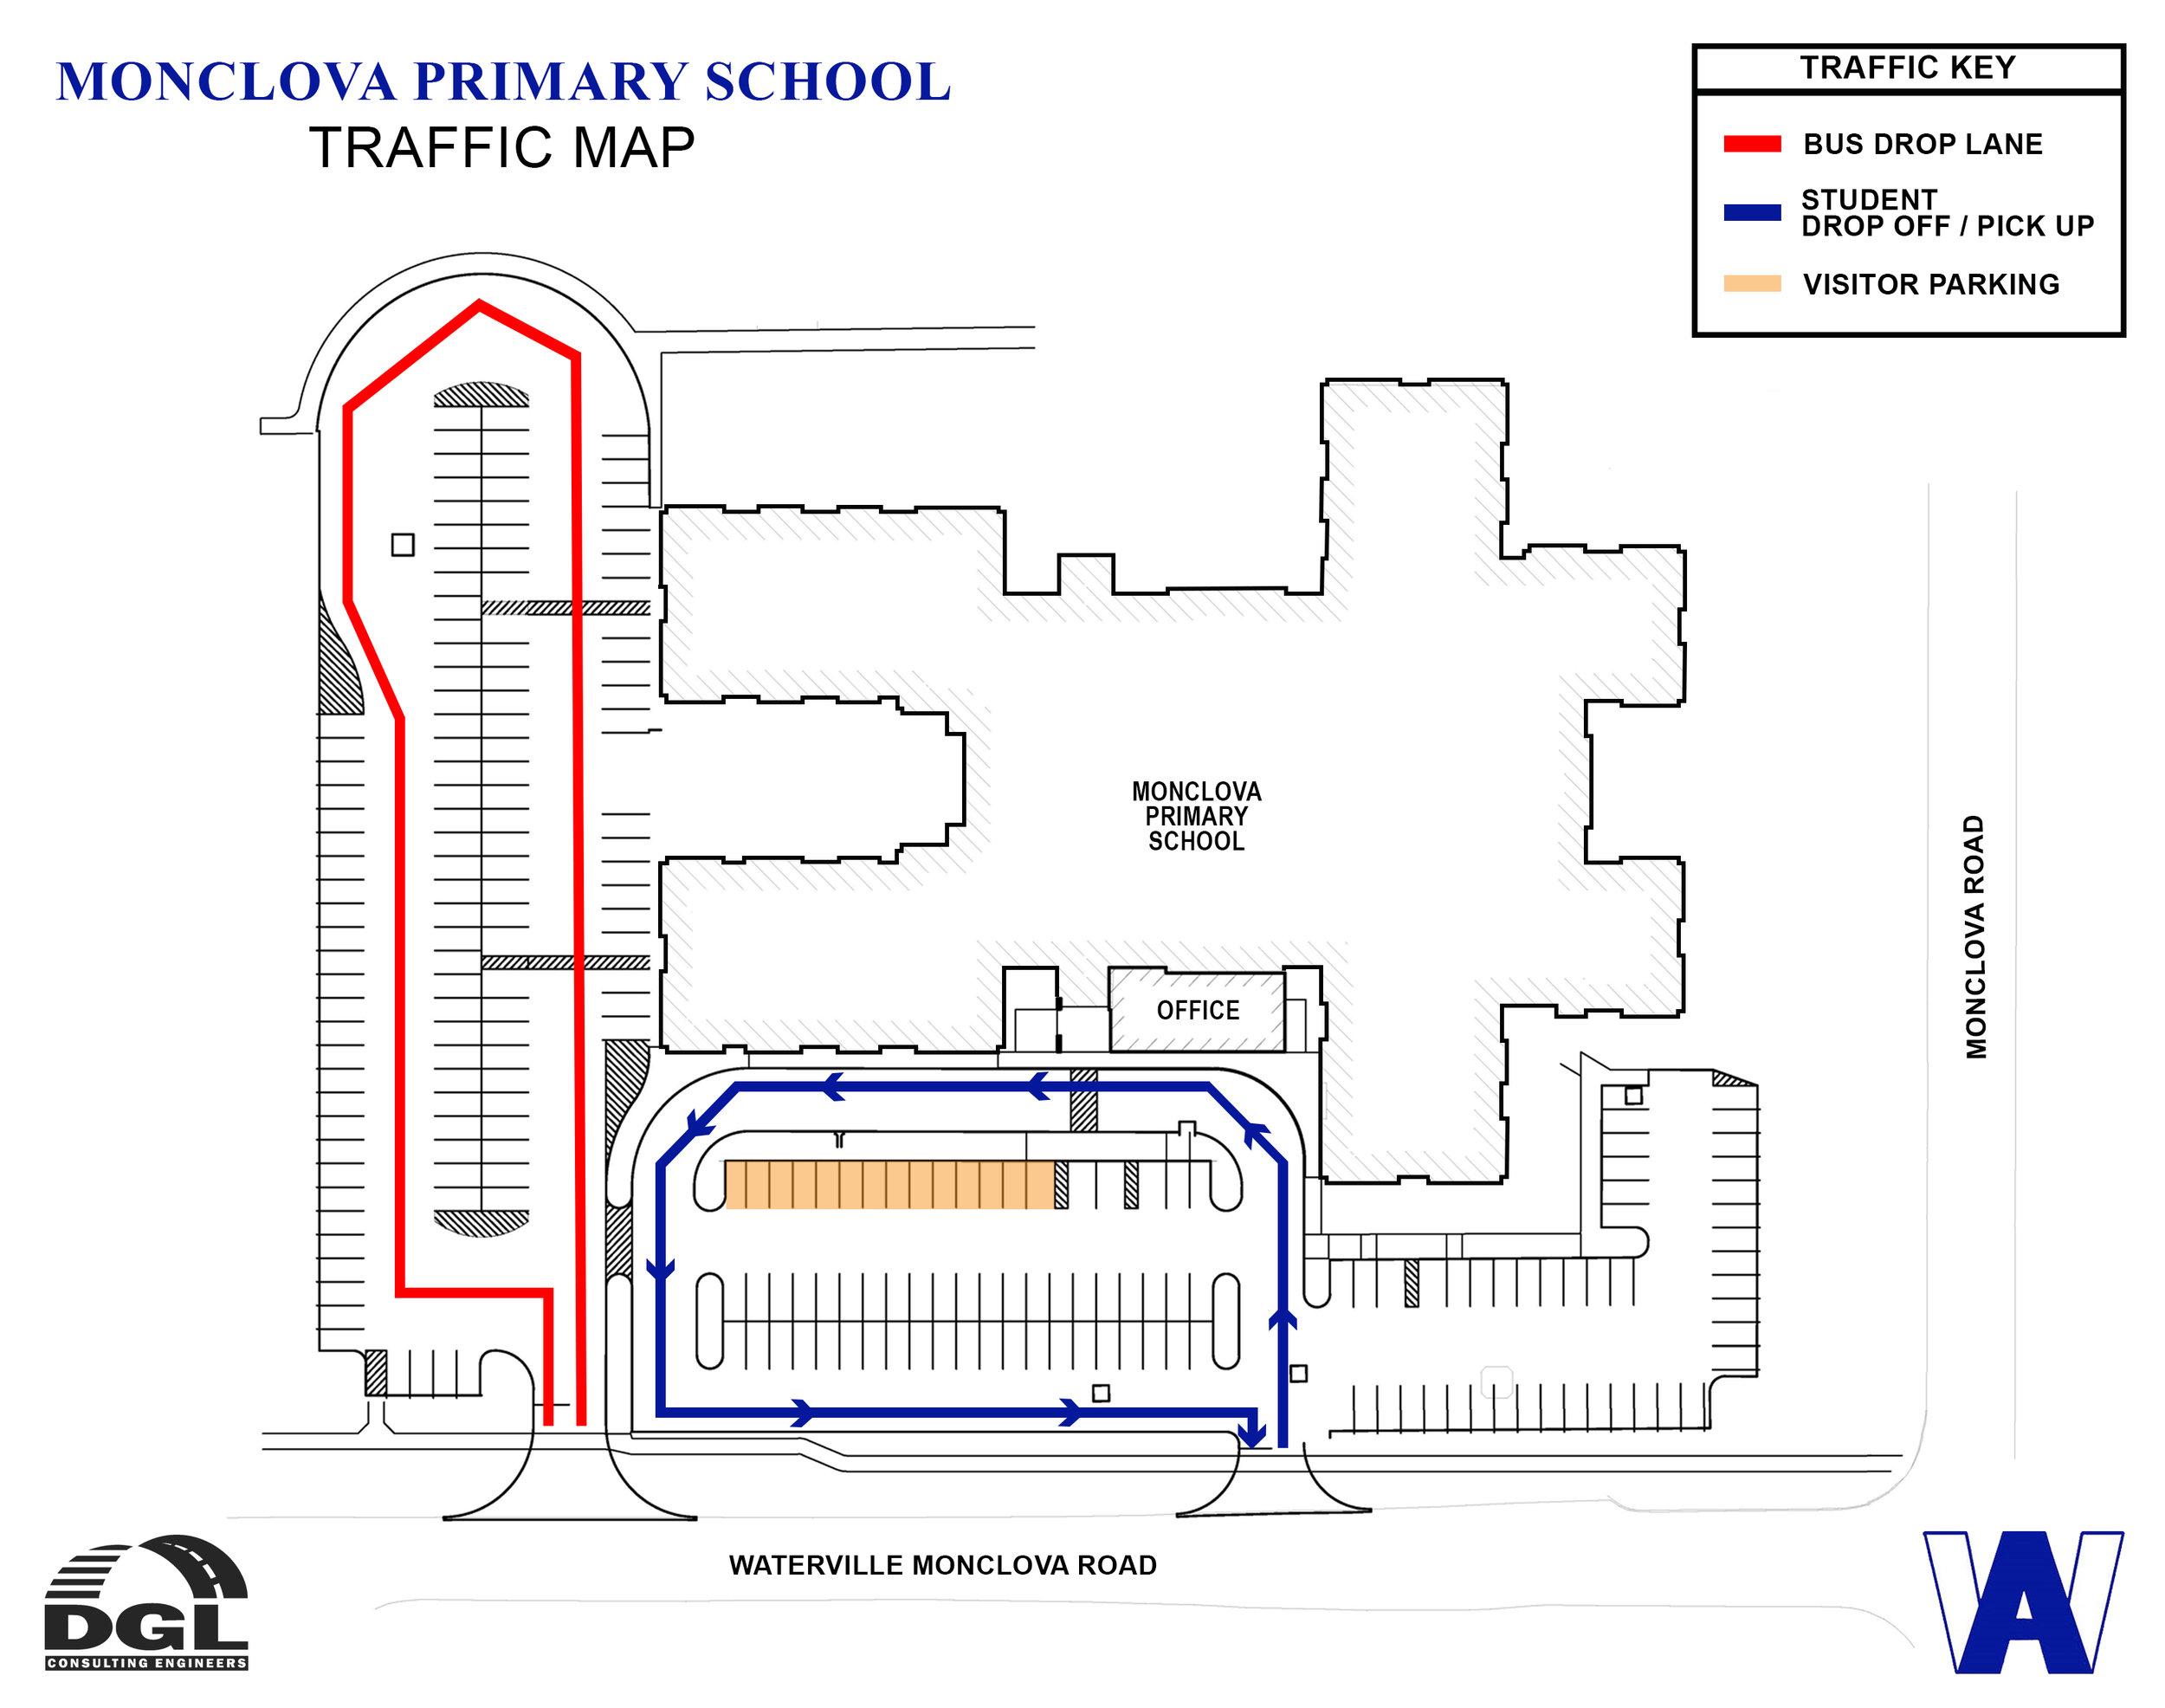 Monclova Primary School Traffic Map.jpg